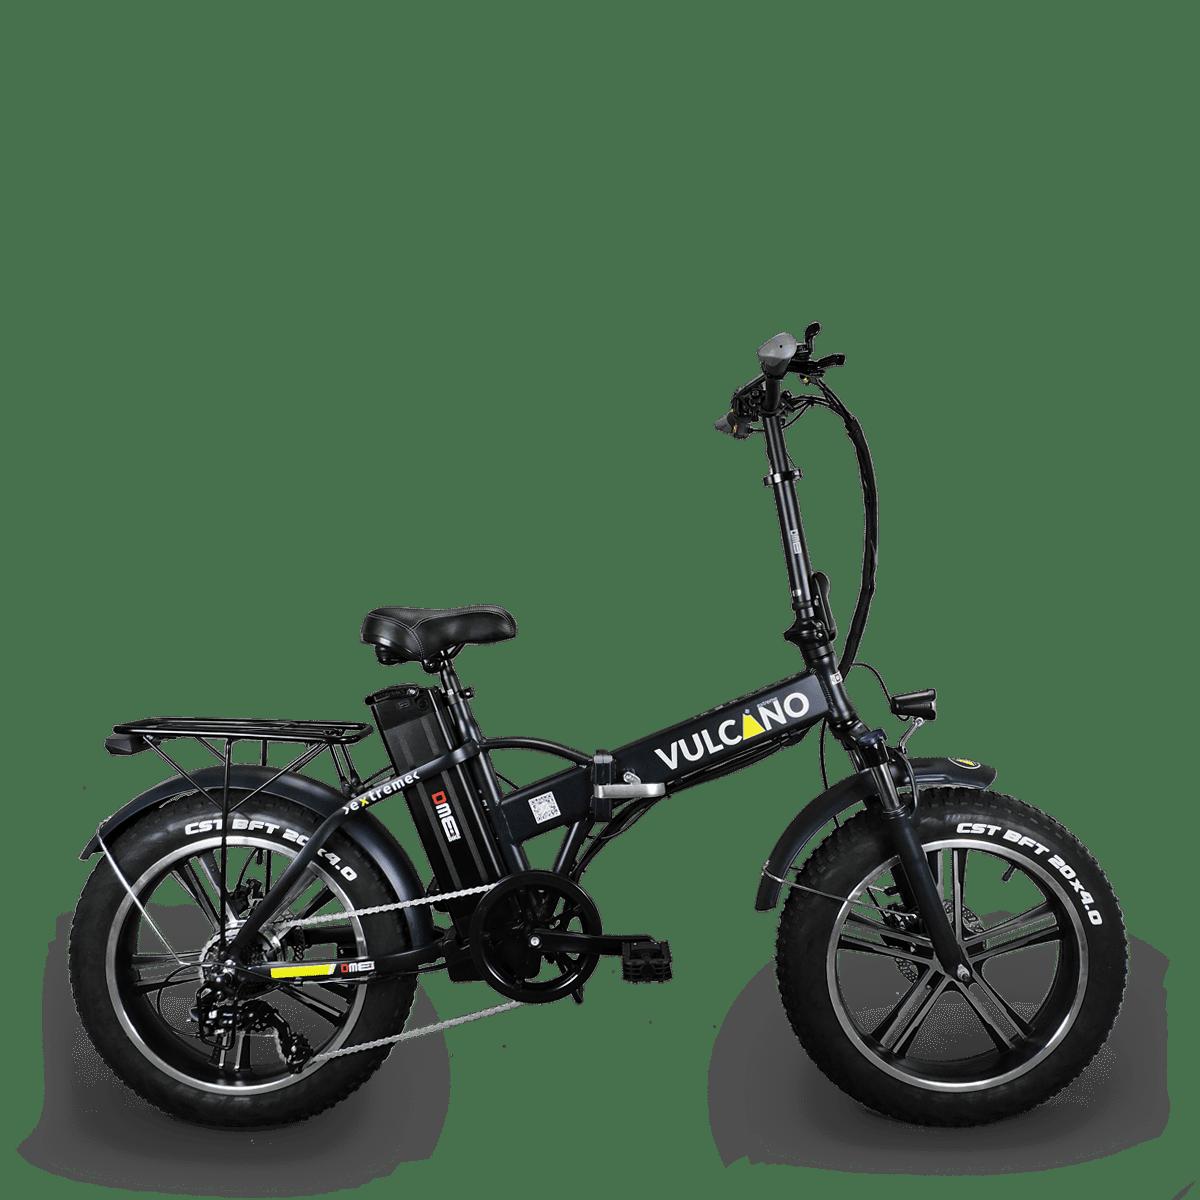 Bici Elettrica Fat Bike Vulcano Extreme V26 350w 48v Dme